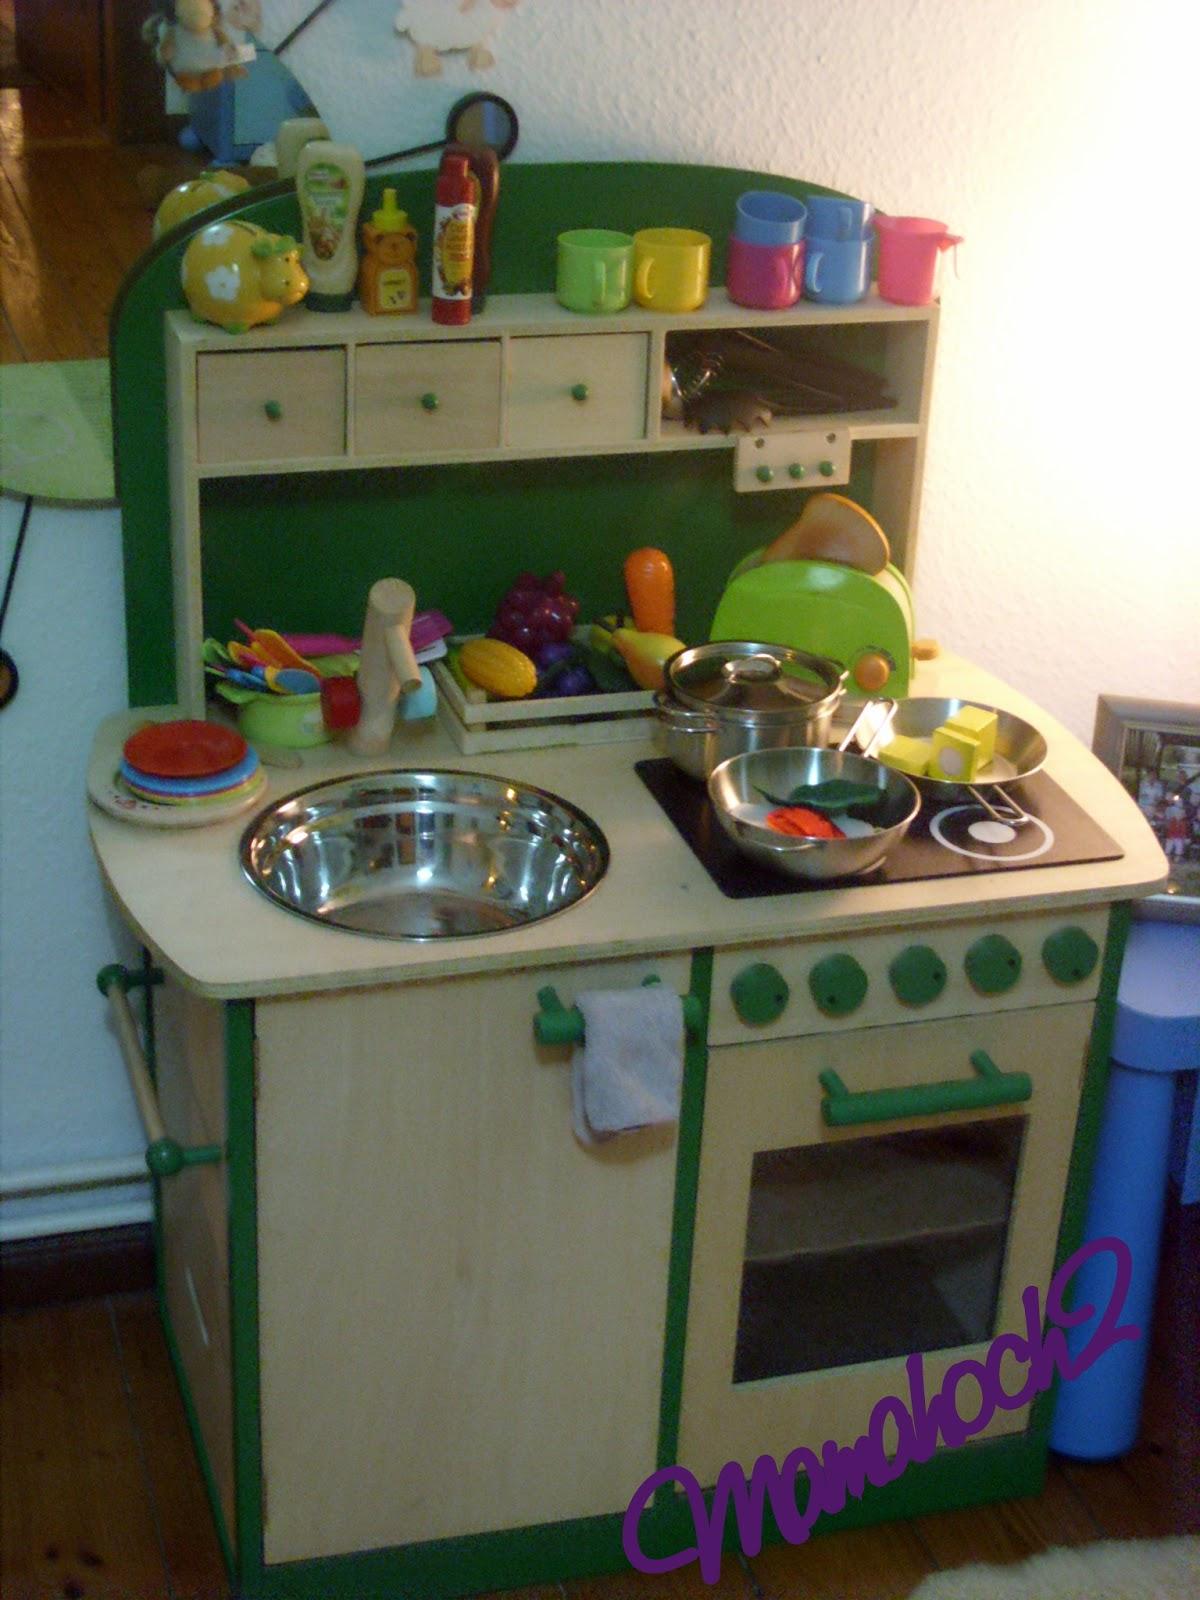 Ikea kinderküche erweitern  Ikea Kinderküche Erweitern | tentfox.com